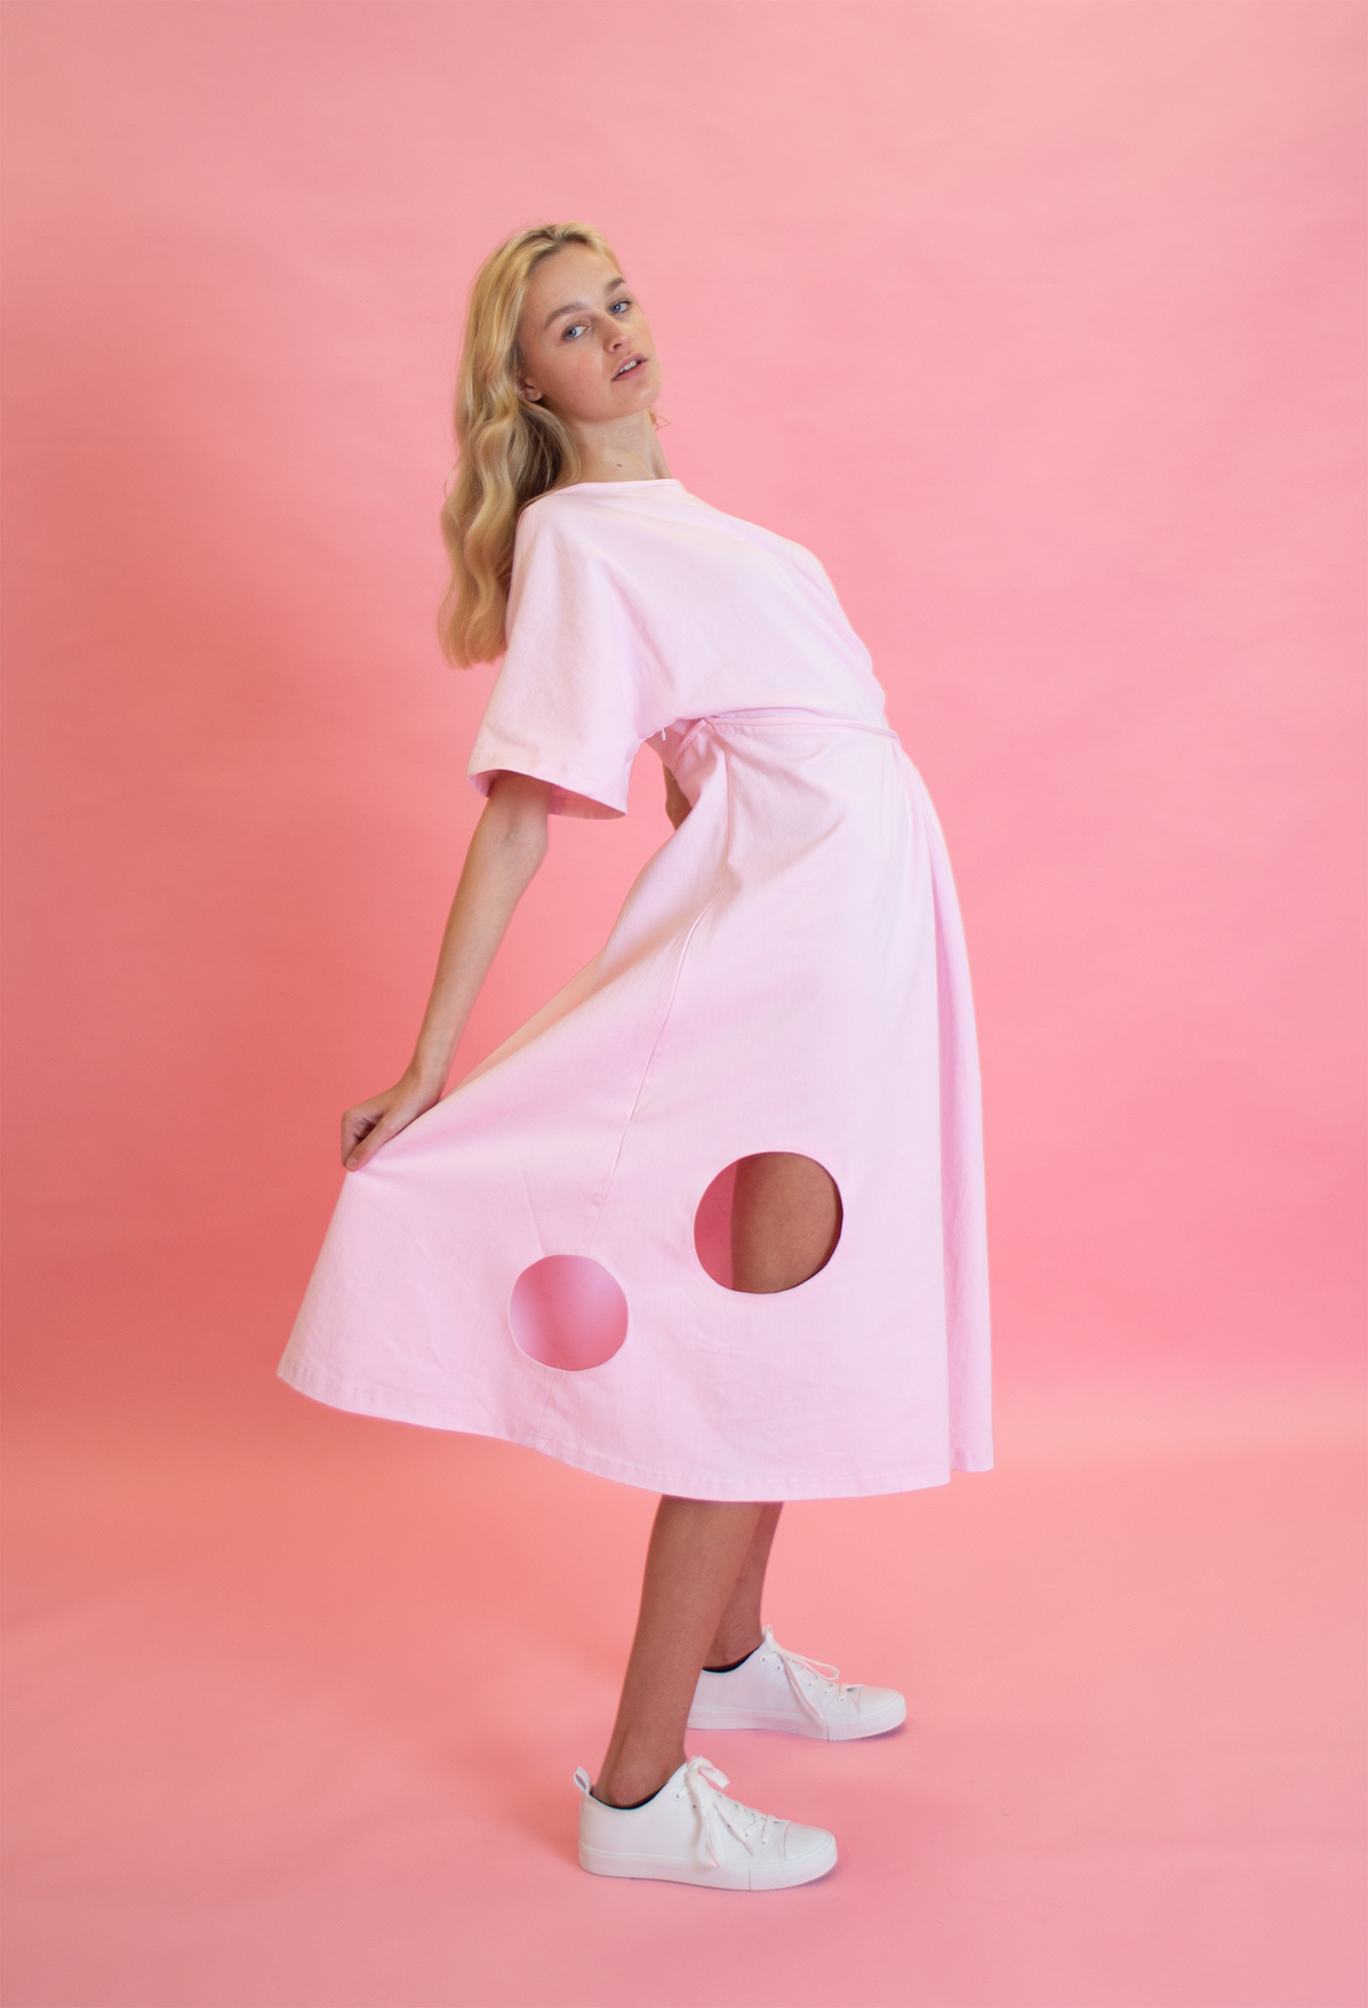 Matthew Aaron Gray Fashion Design and Promotion